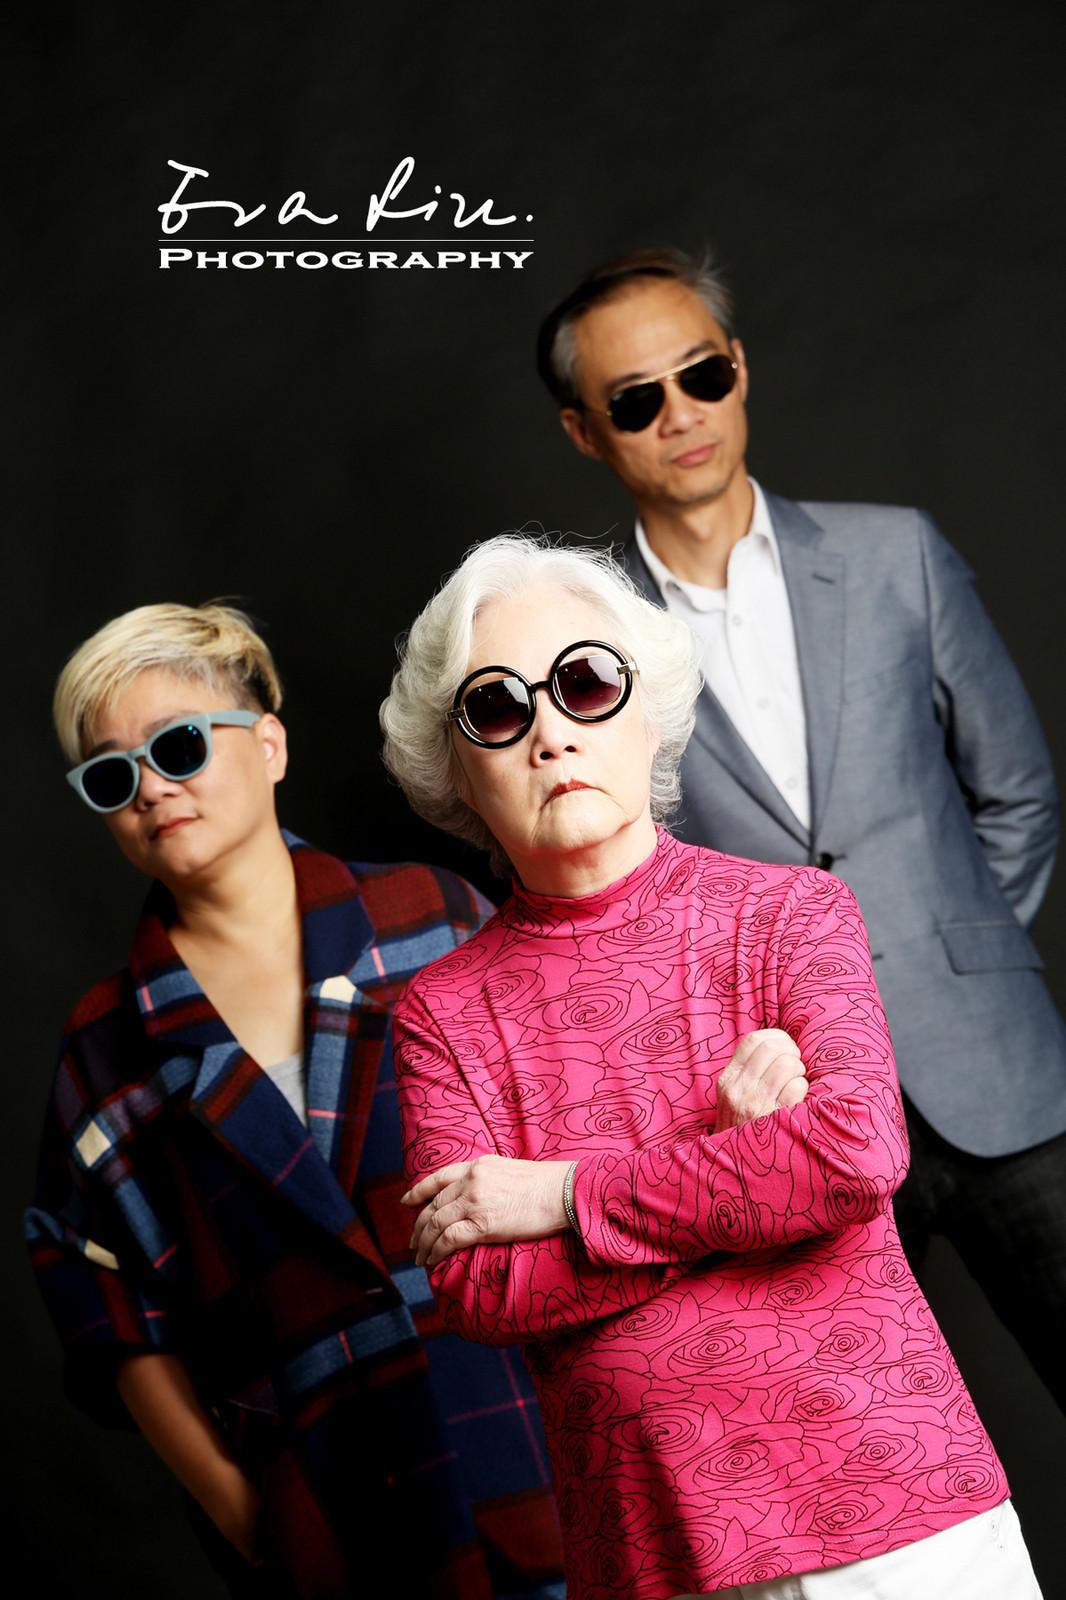 cool grandma and stylish mother